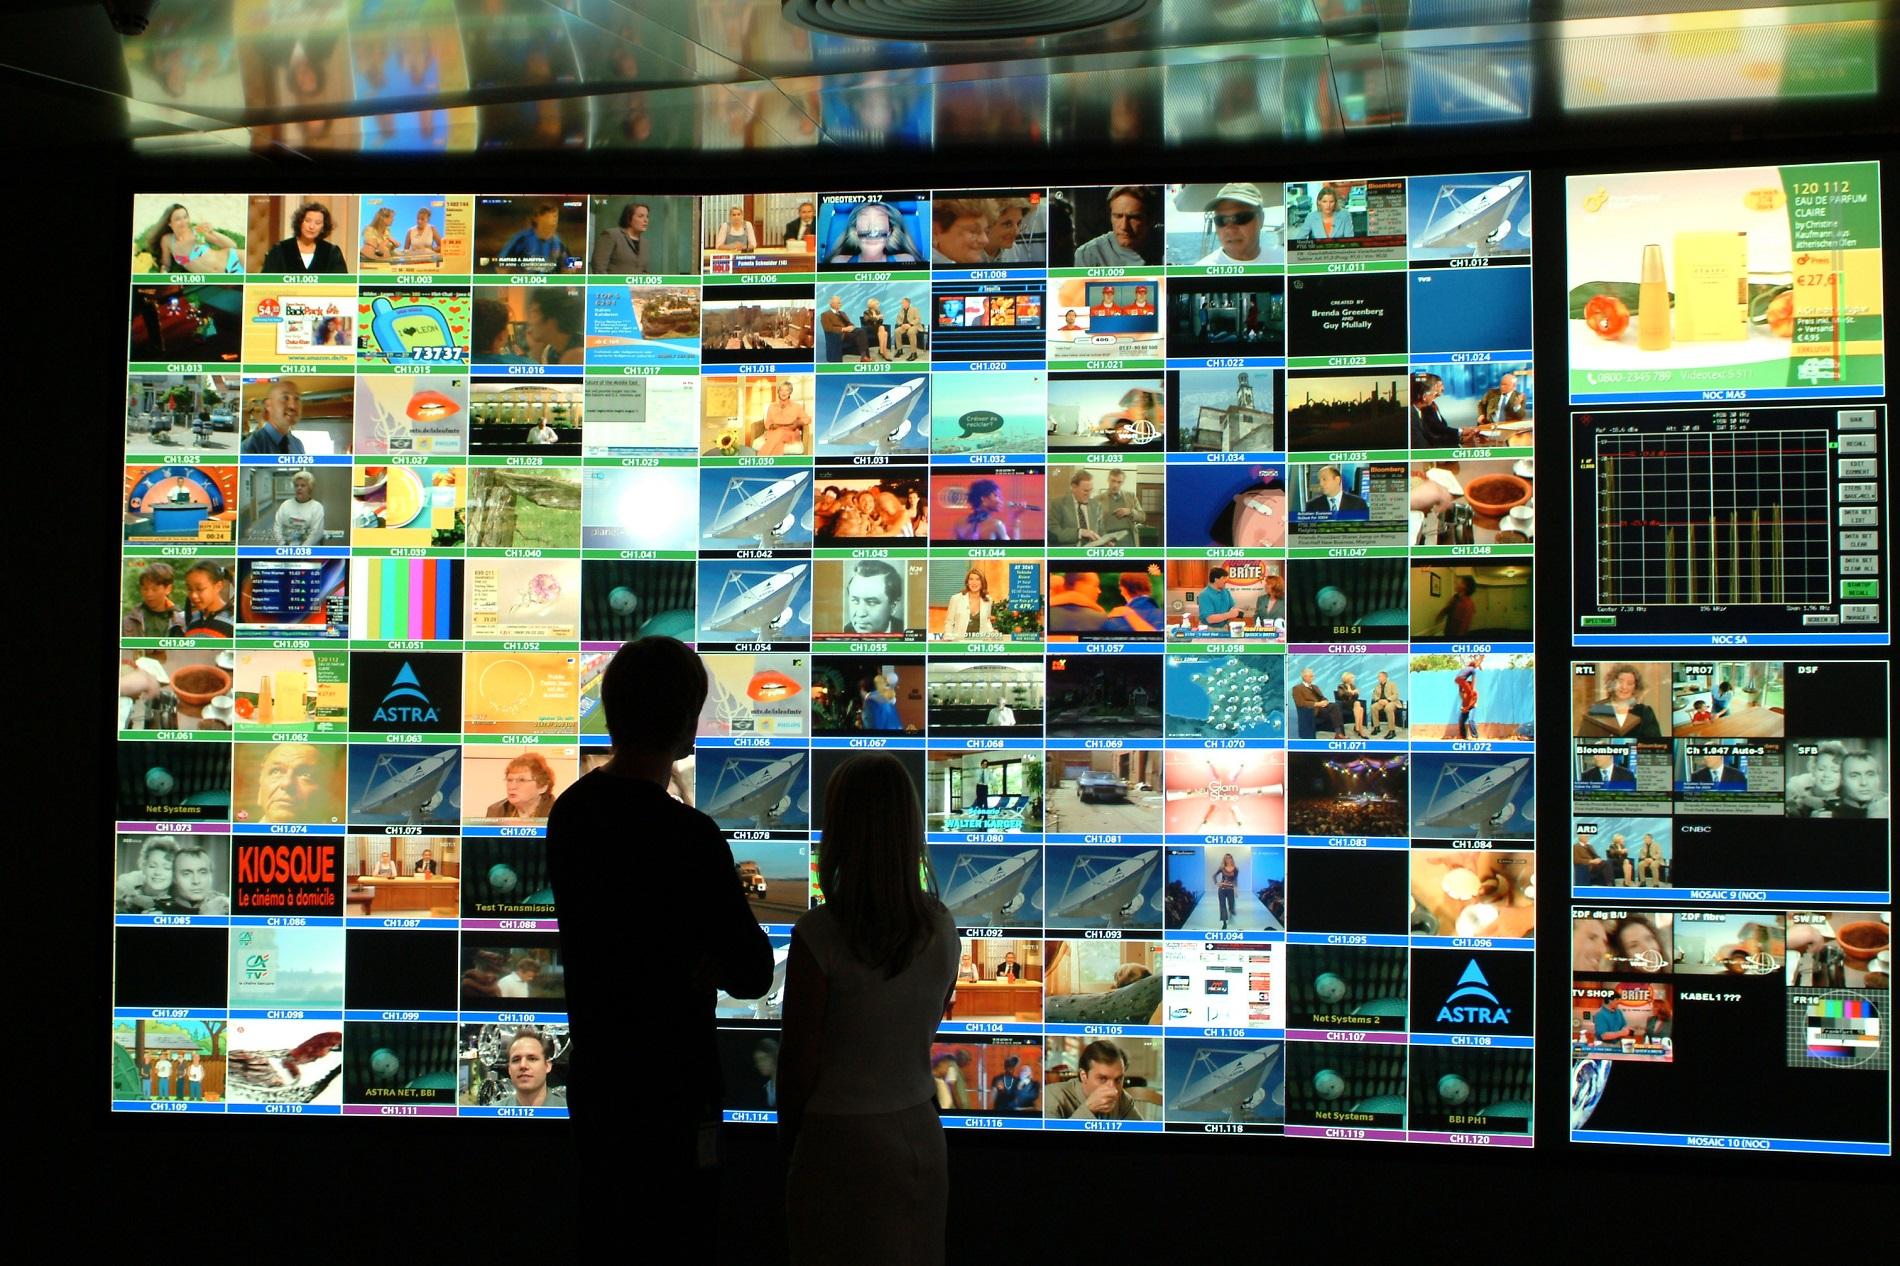 Стало известно, сколько платят россияне за ТВ